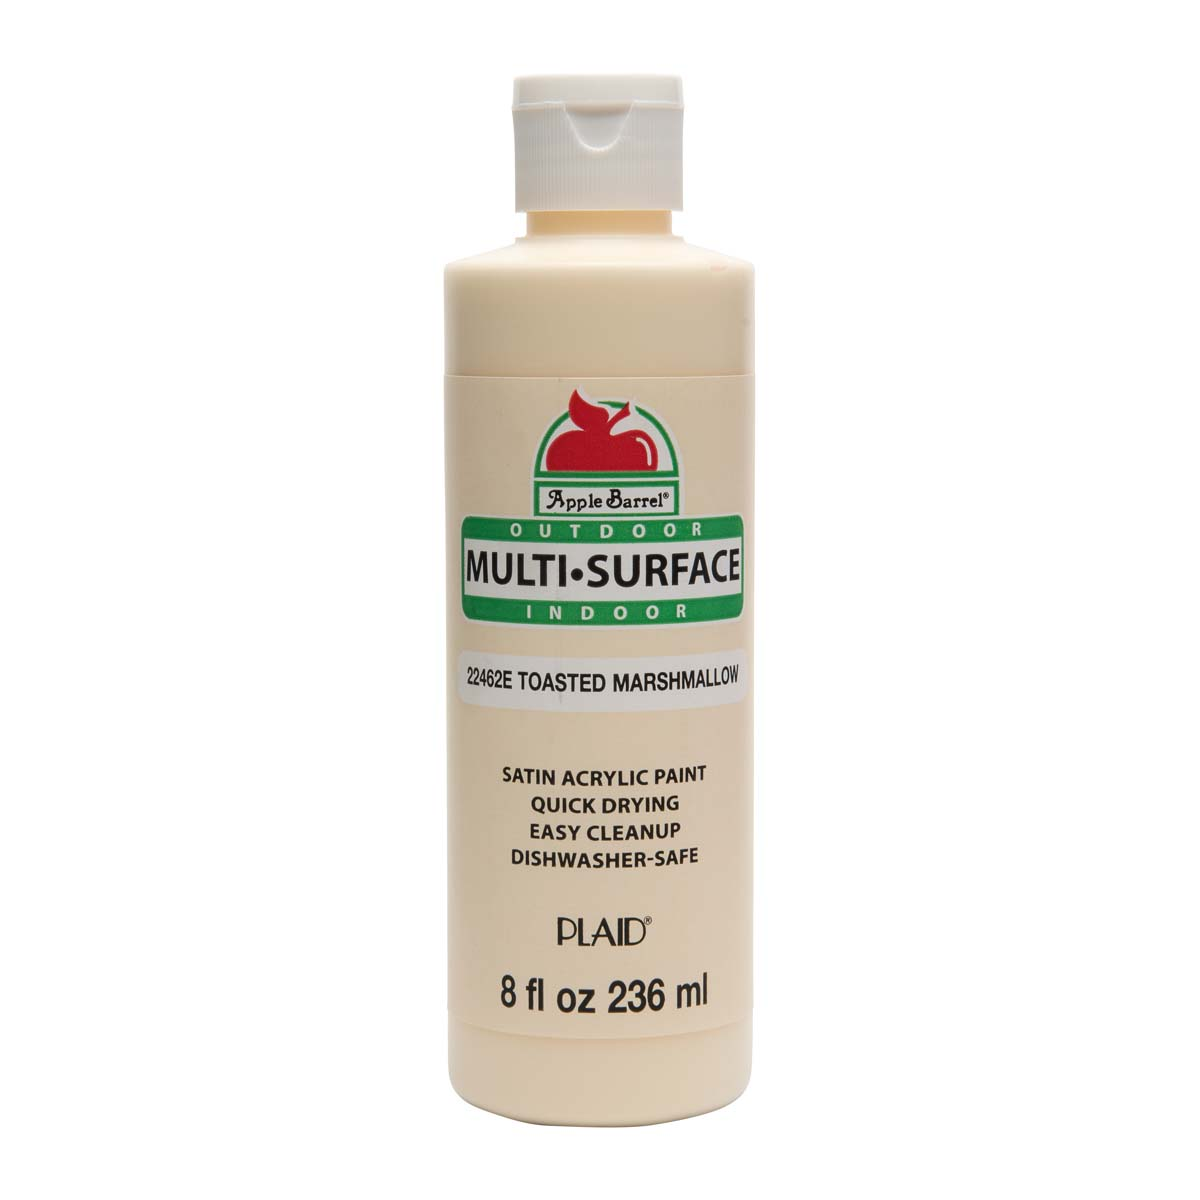 Apple Barrel ® Multi-Surface Satin Acrylic Paints - Toasted Marshmallow, 8 oz. - 22462E